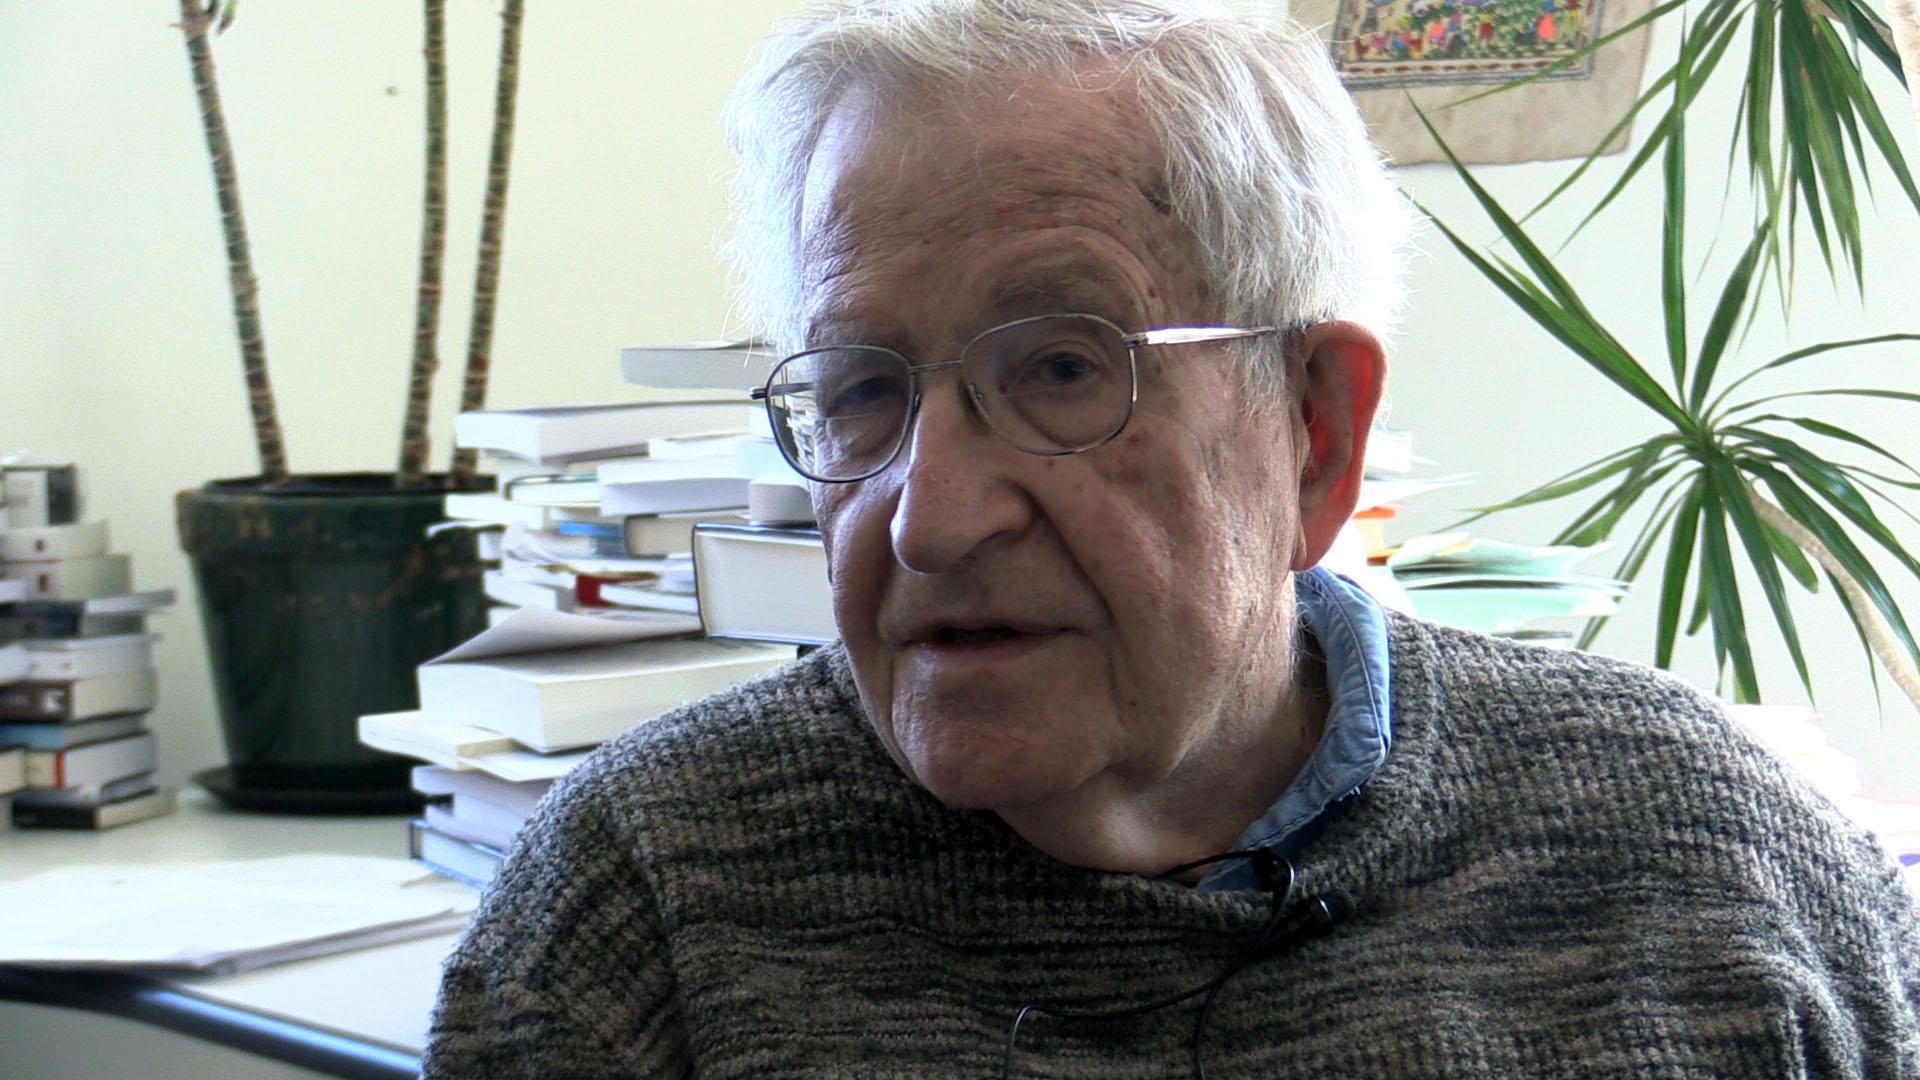 Dr. Noam Chomsky, MIT Professor Emeritus, Author, Activist, Linguist, and Eminent Scholar  Photo: @ 2019 Stephen Newton